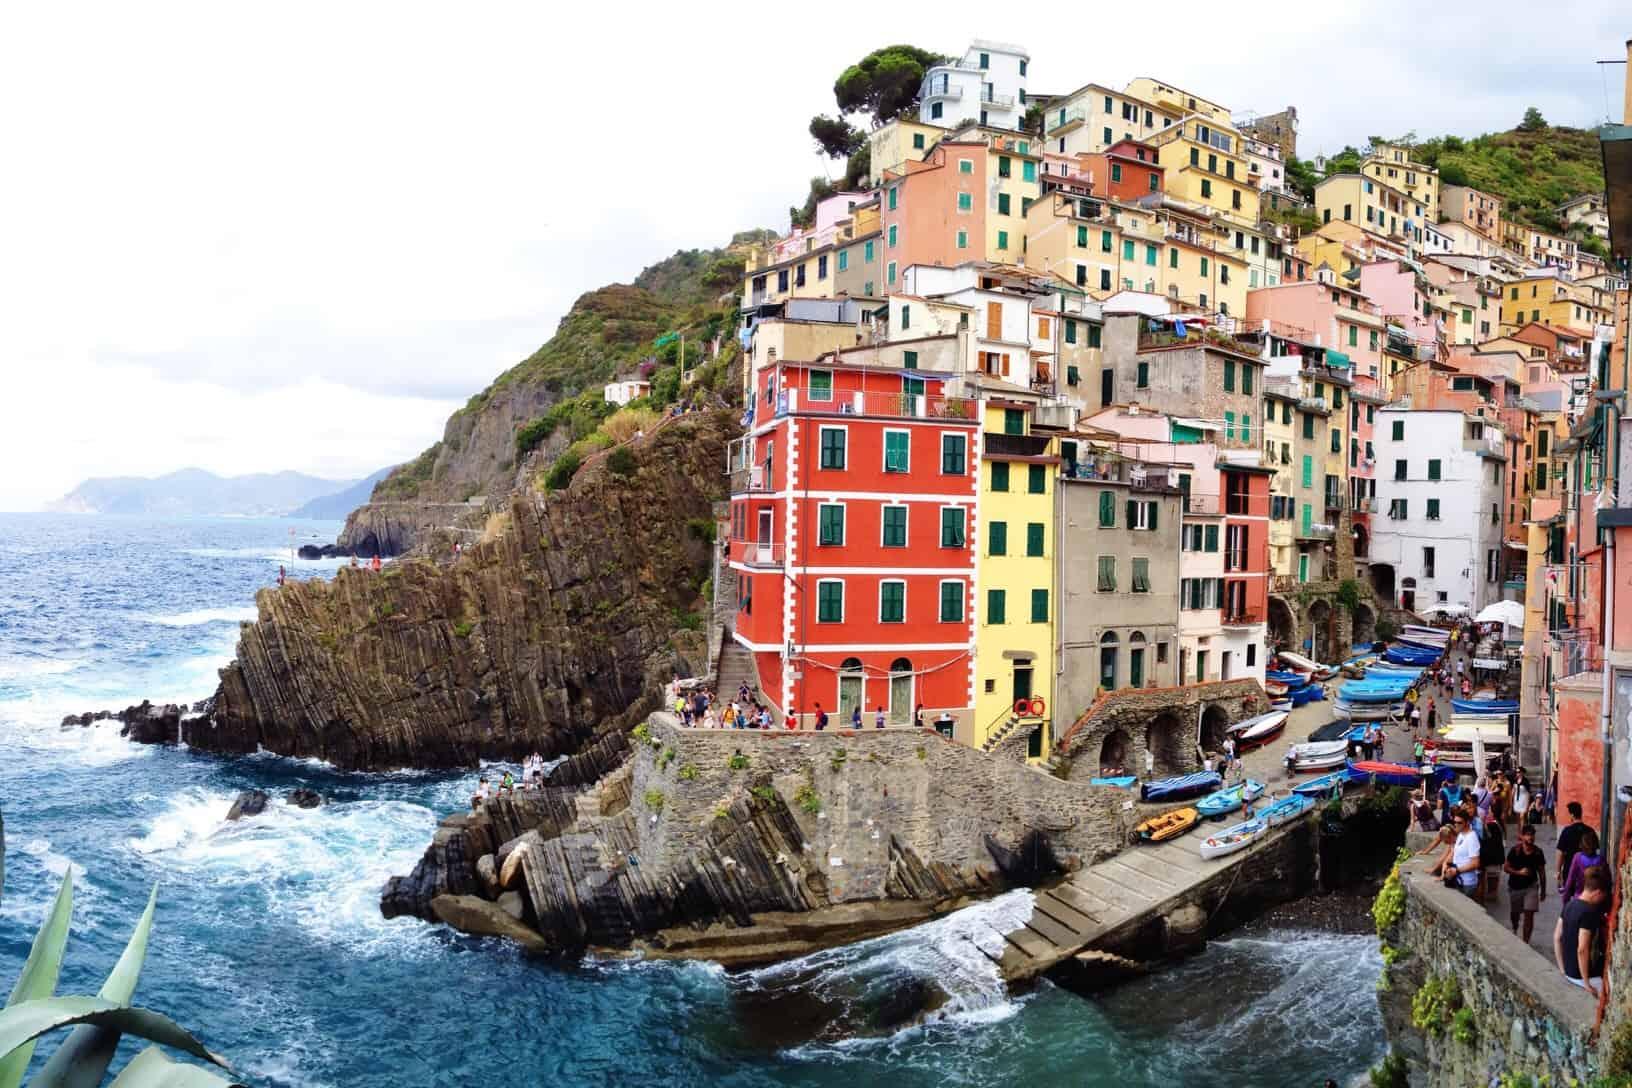 Cinque Terre town on the sea